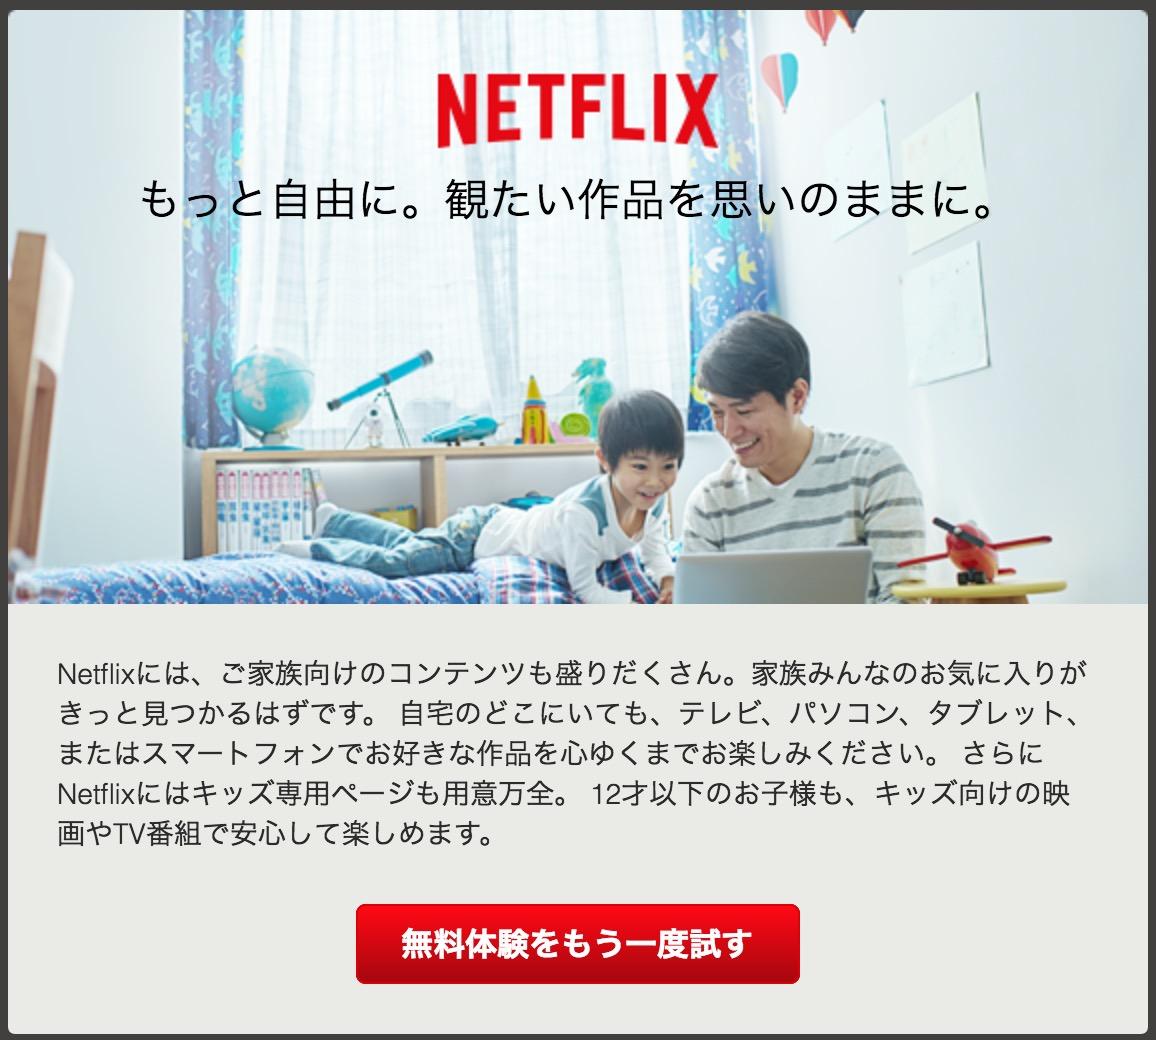 Netflixを一度解約したのに再び無料体験ができることに!?